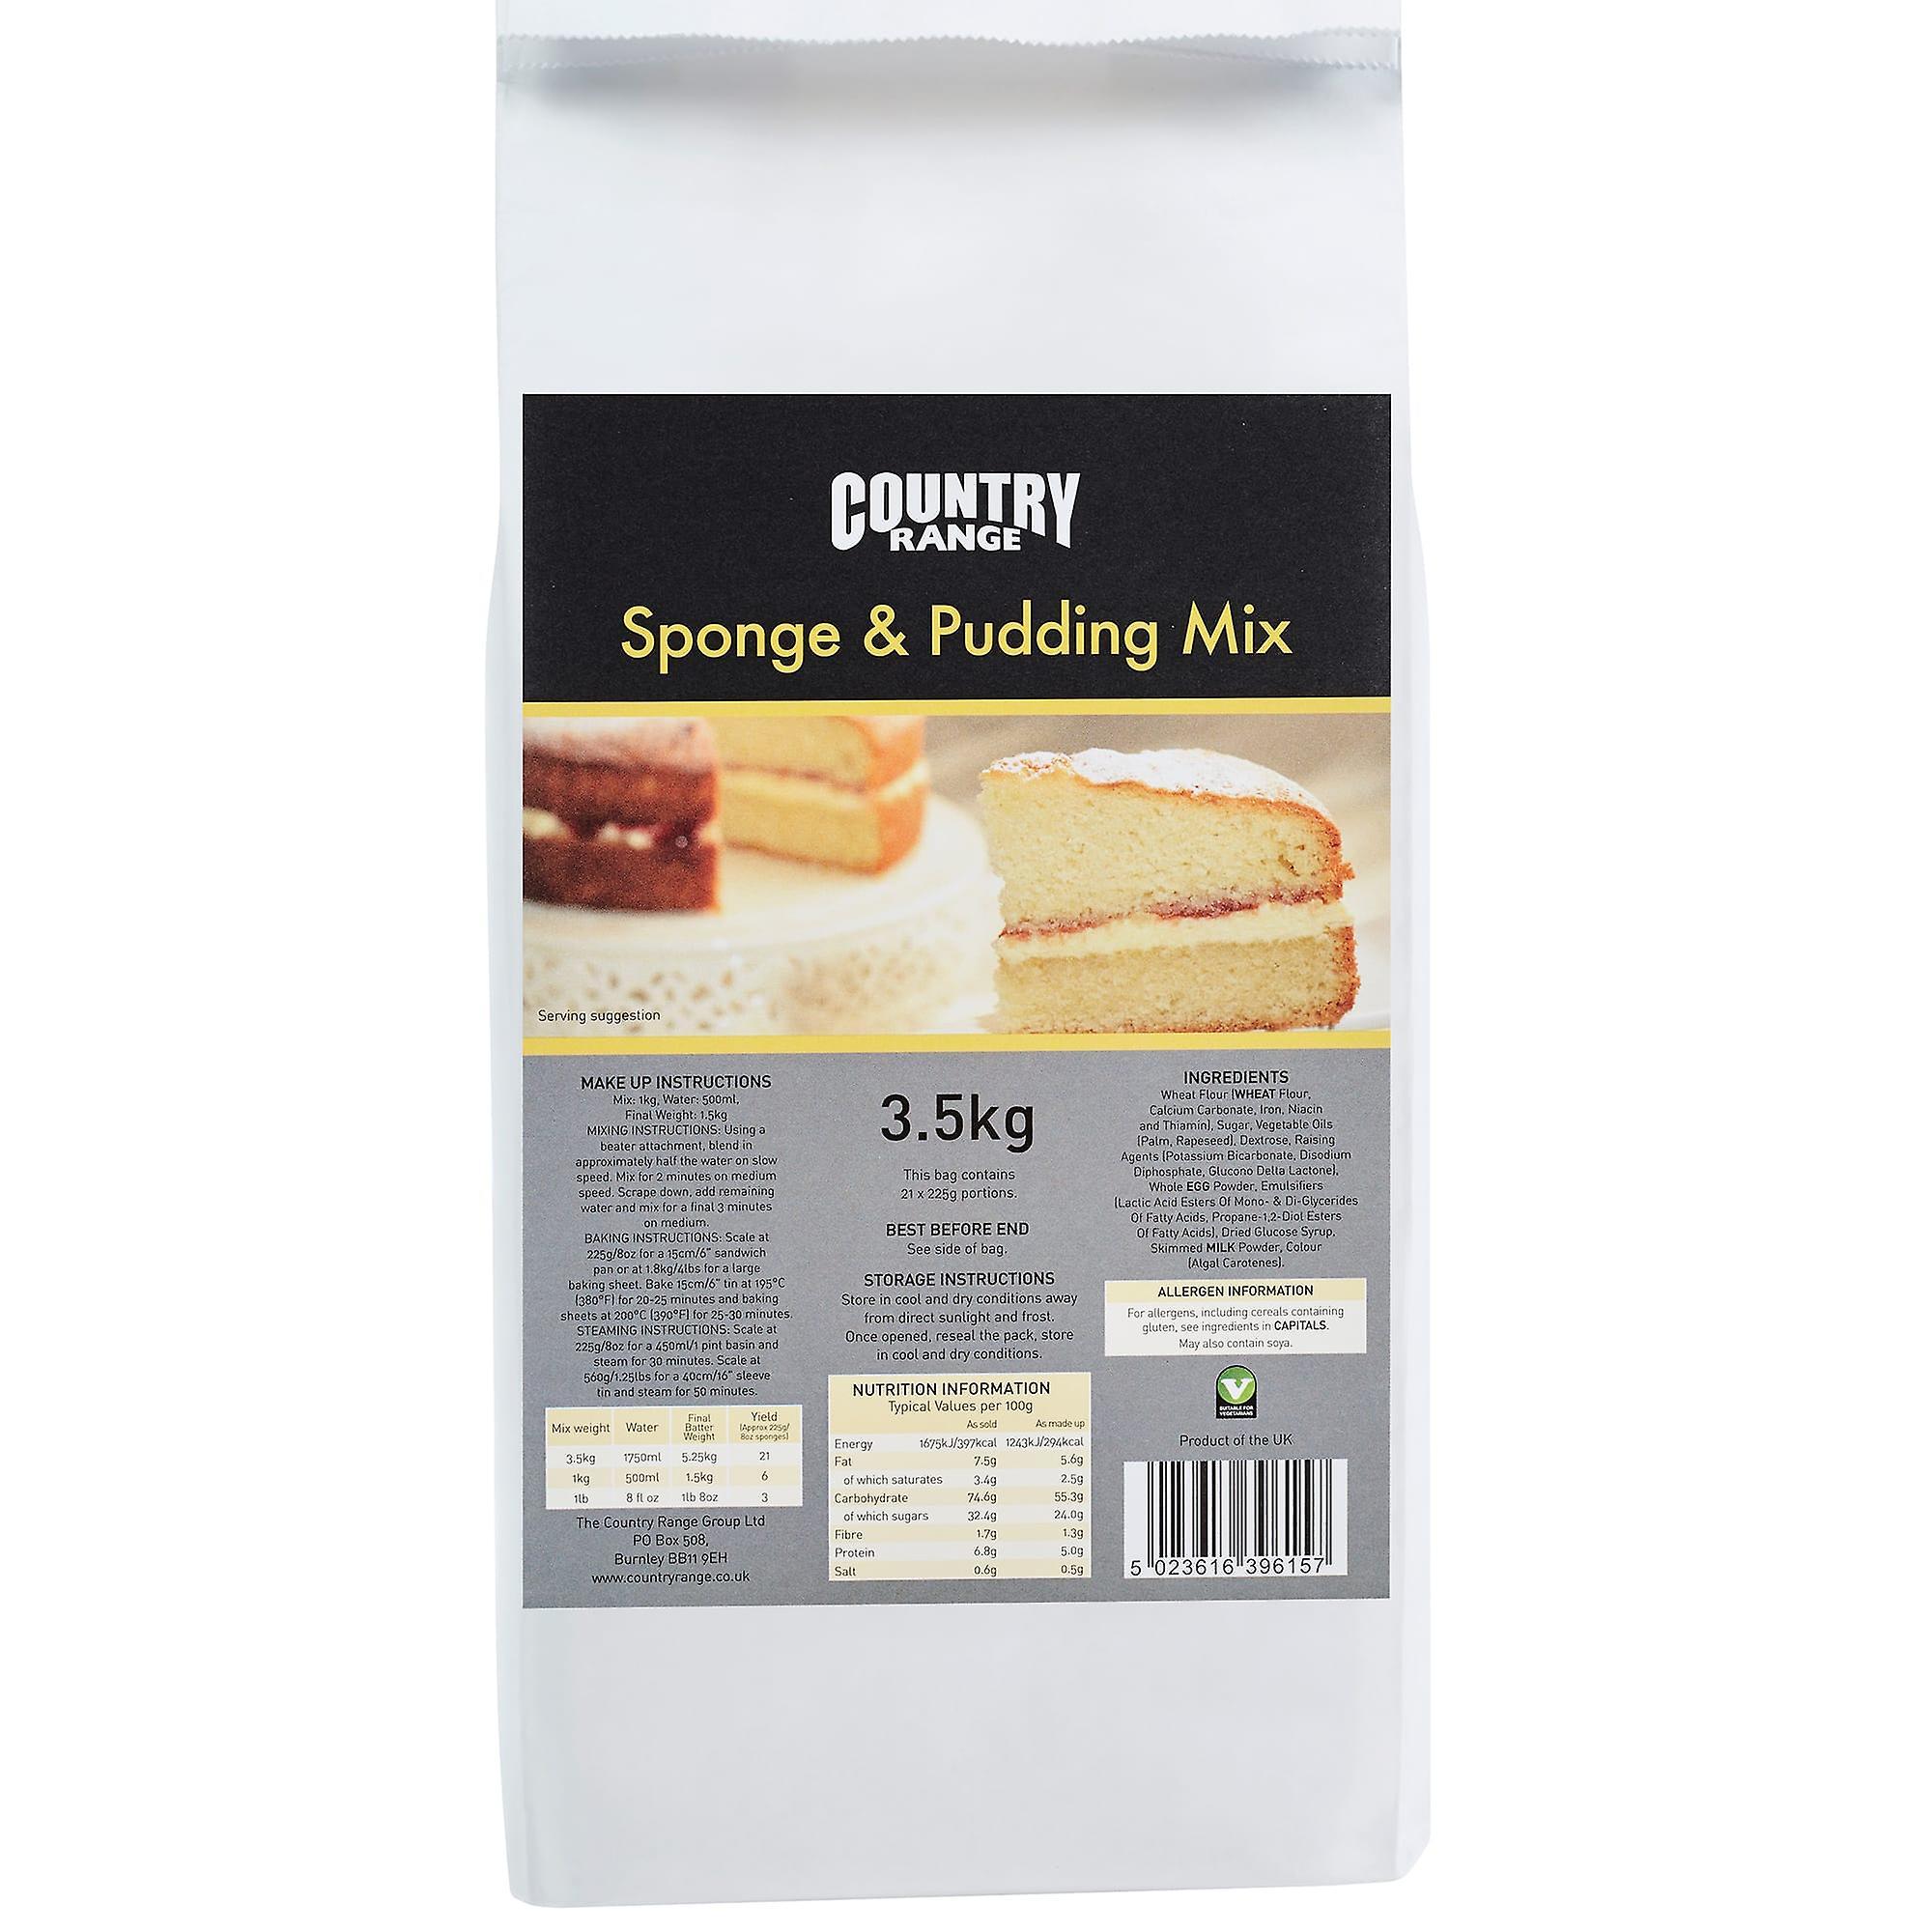 Country Range Sponge & Pudding Mix